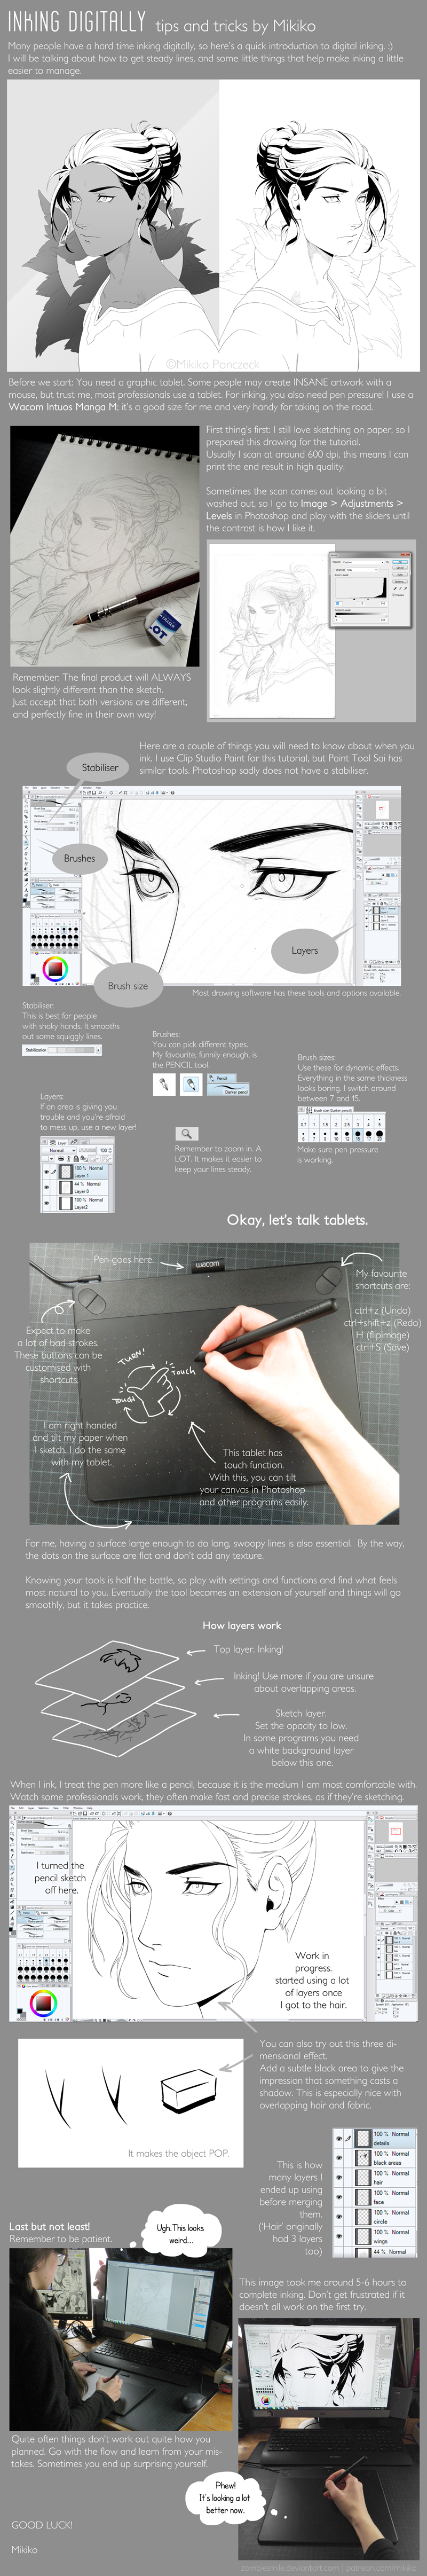 Inking Digitally - tips and tricks